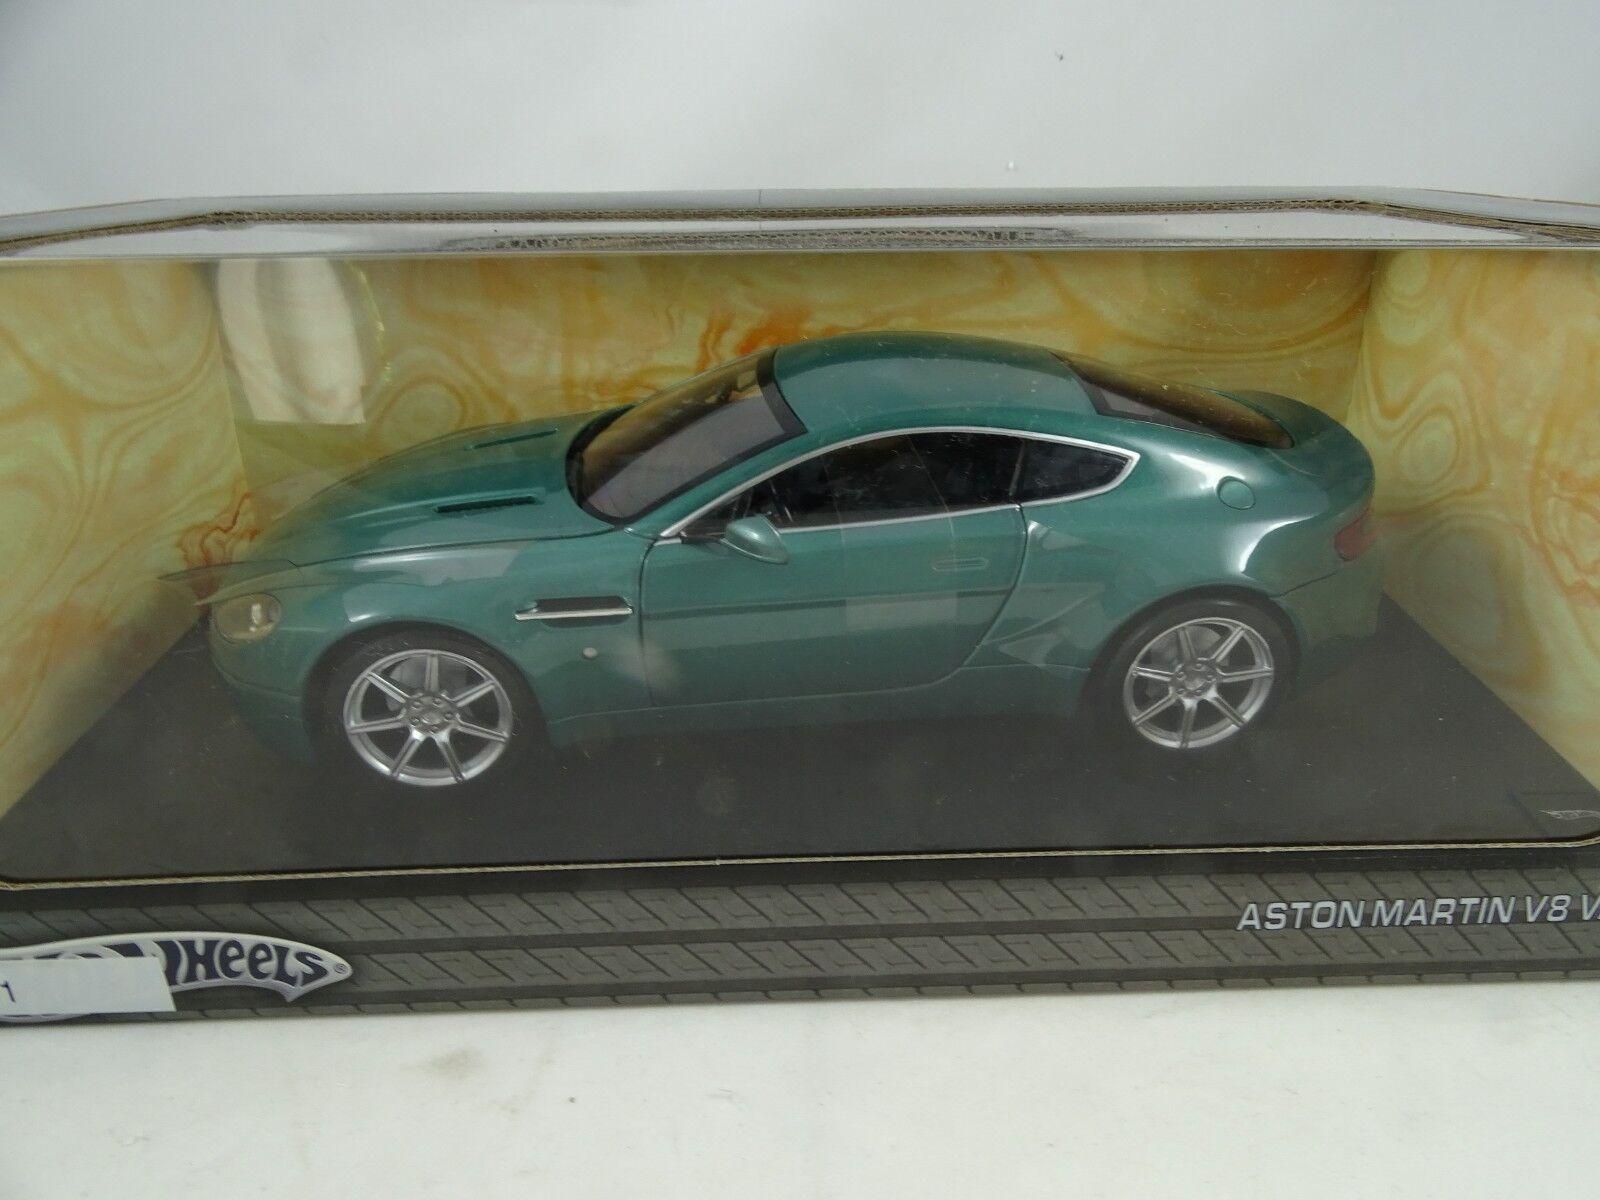 Hot Wheels H3068 Aston Martin V8 Vanatge MintVerde - Rareza